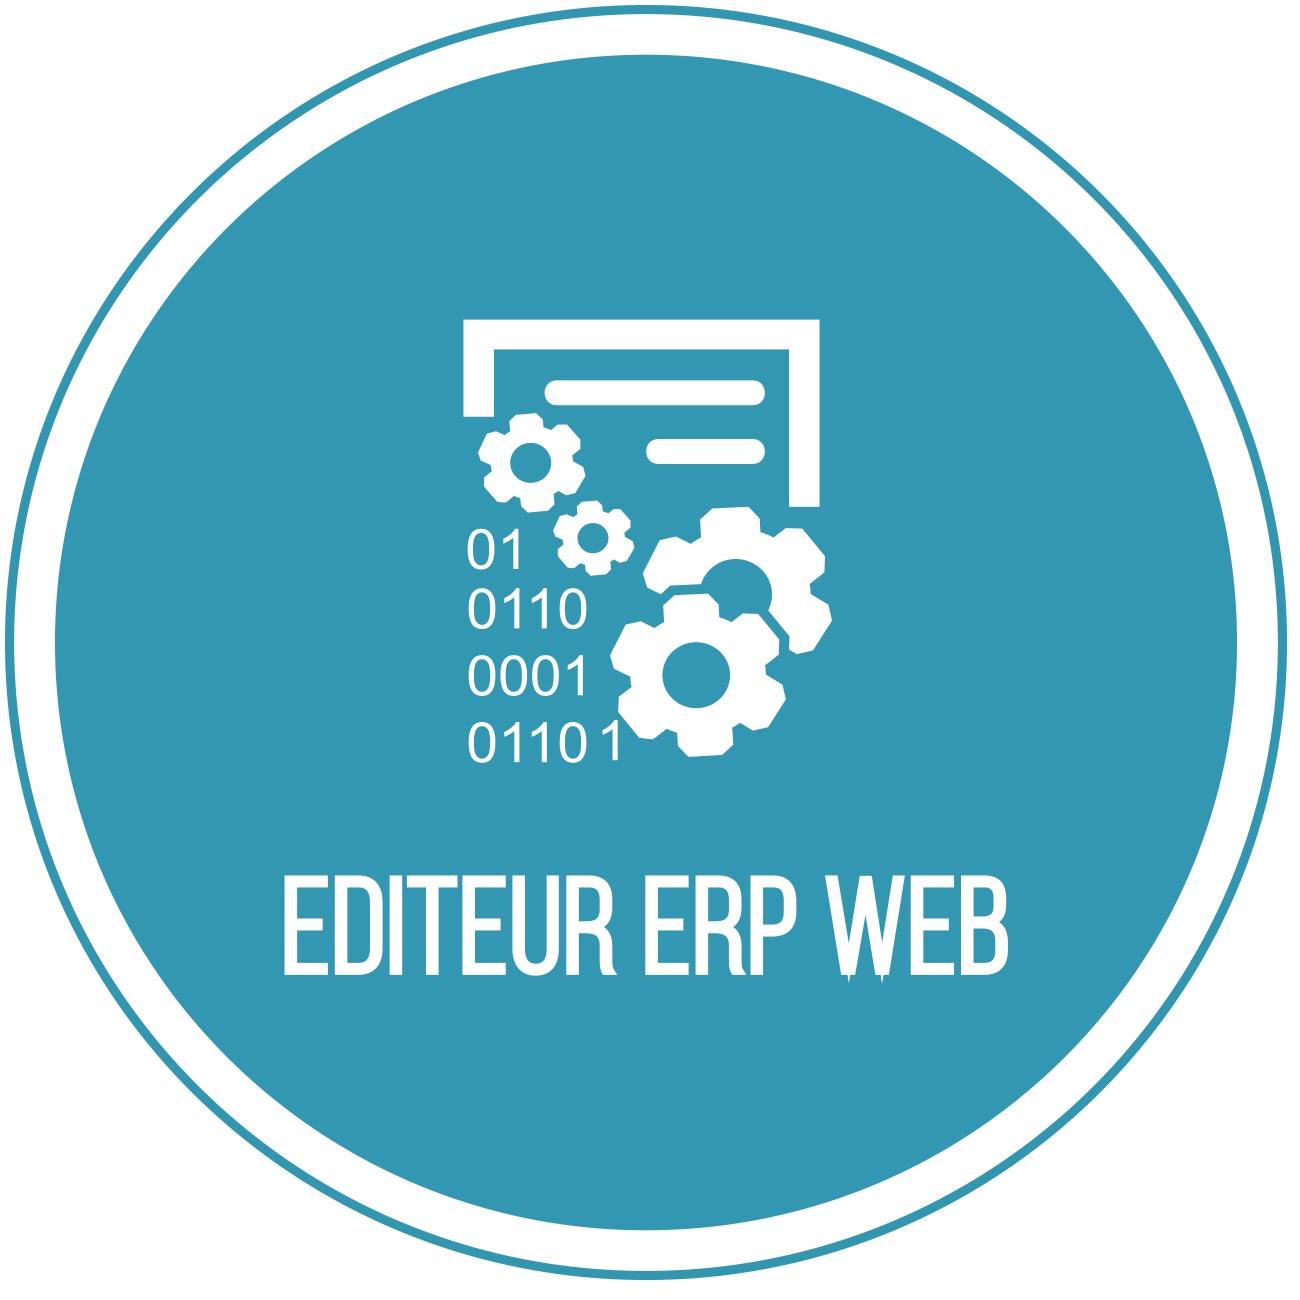 Editeur ERP Web